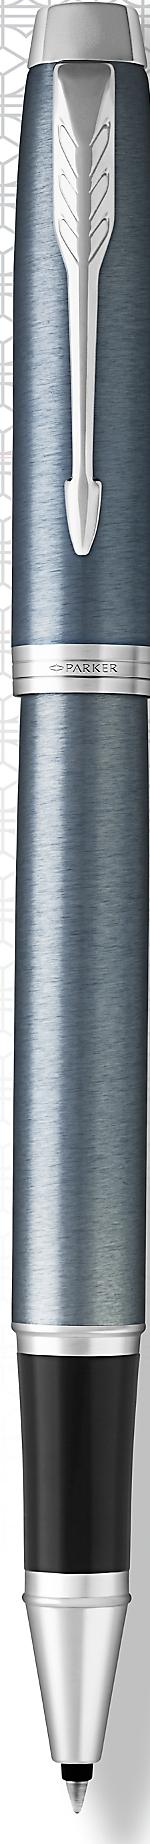 Ручка Parker  IM Metal Silver CT роллер